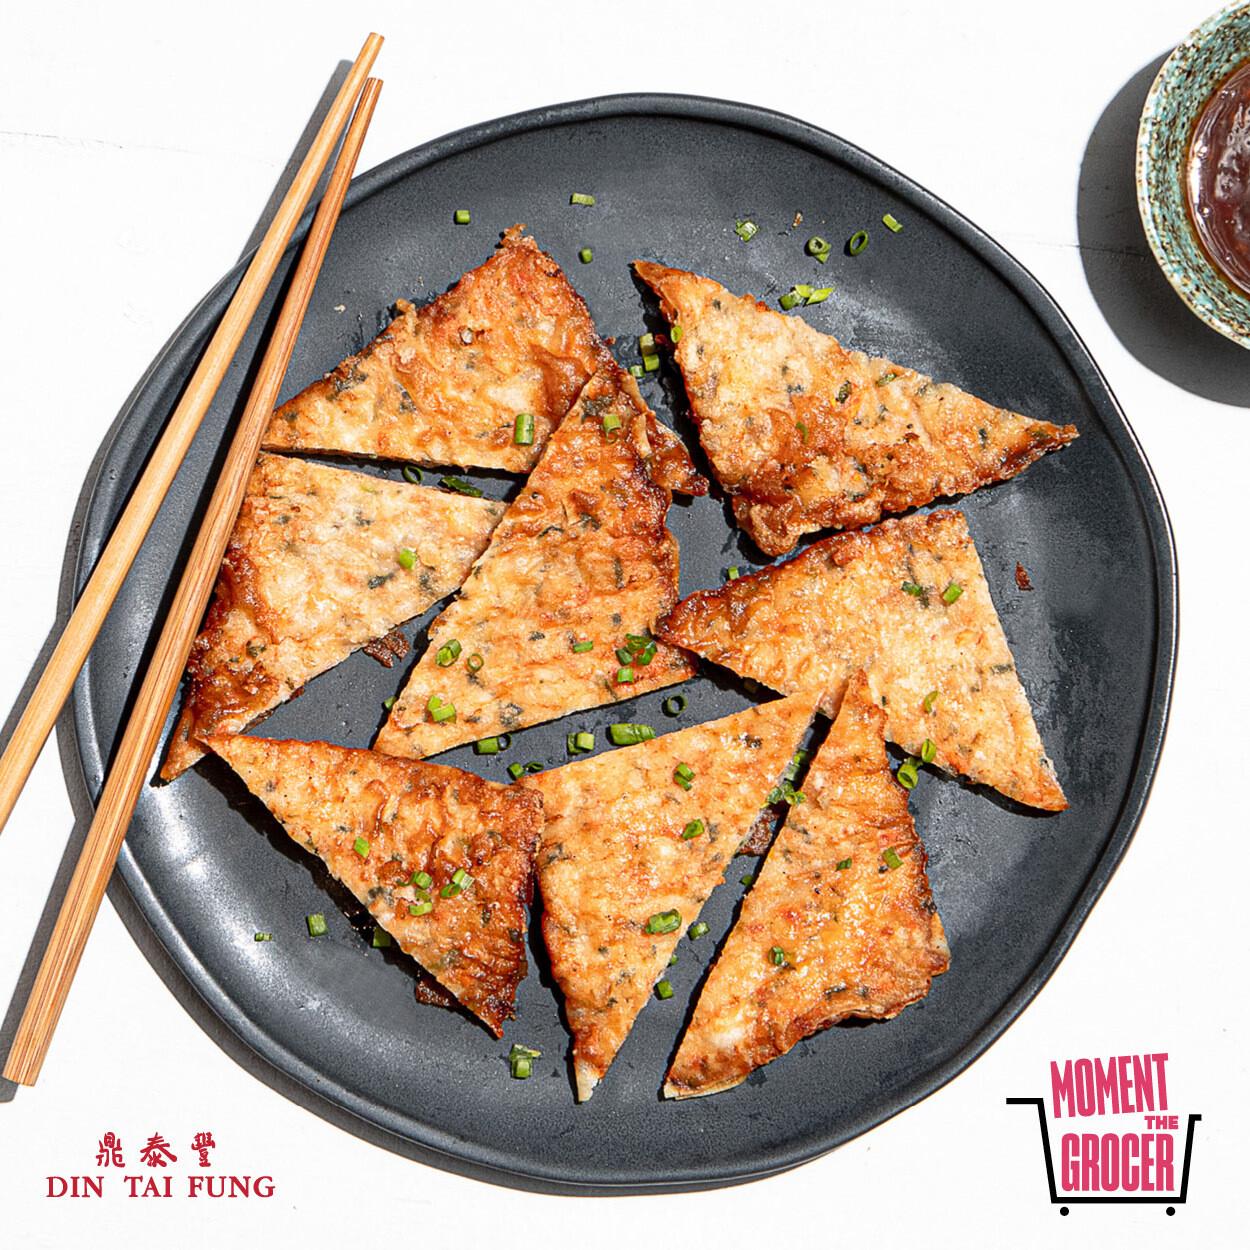 Din Tai Fung Golden Prawn Cake with Sweet Chili Sauce